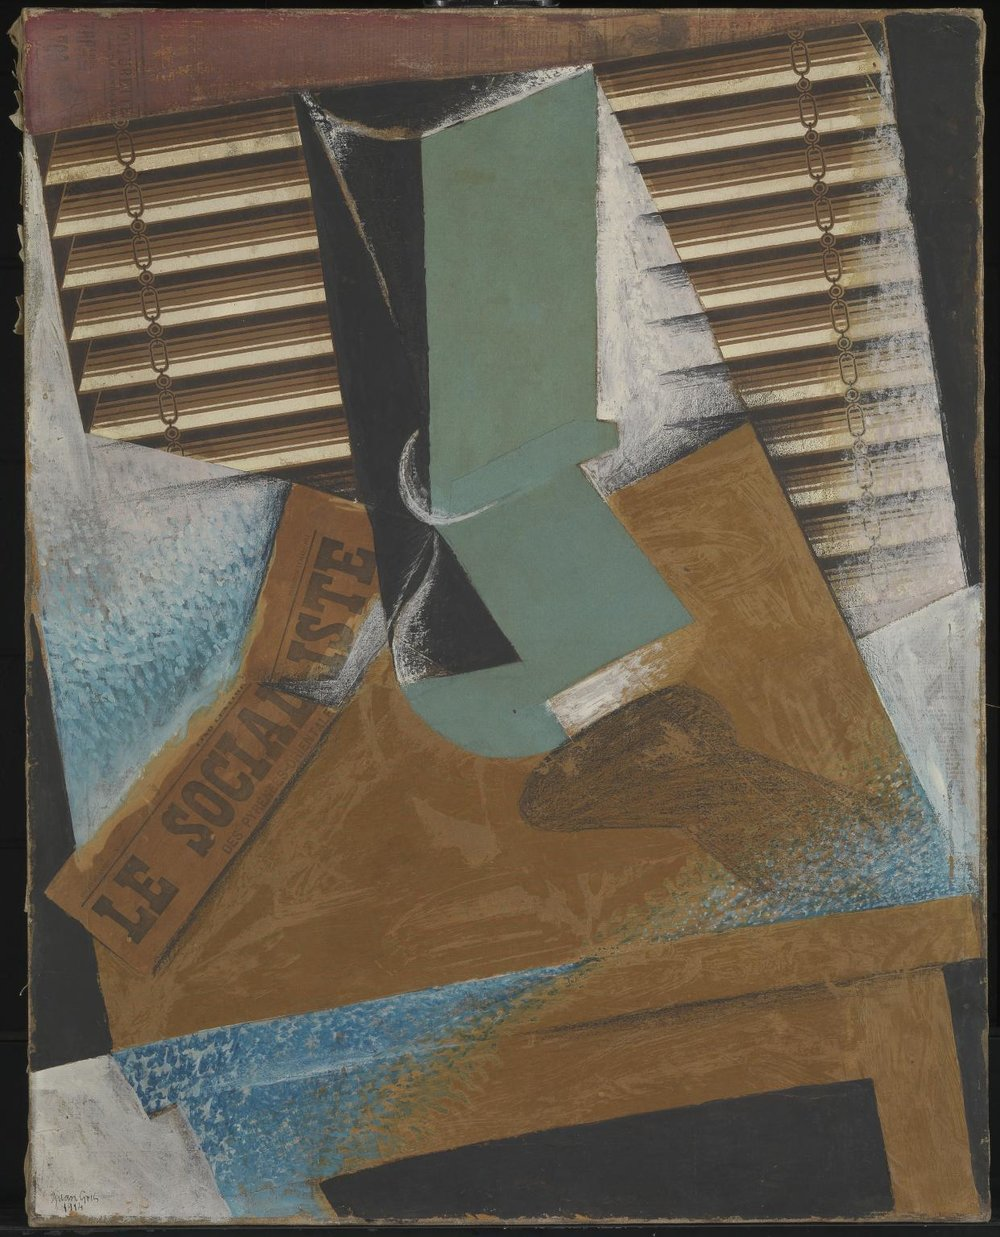 Juan Gris, The Sunblind, 1914